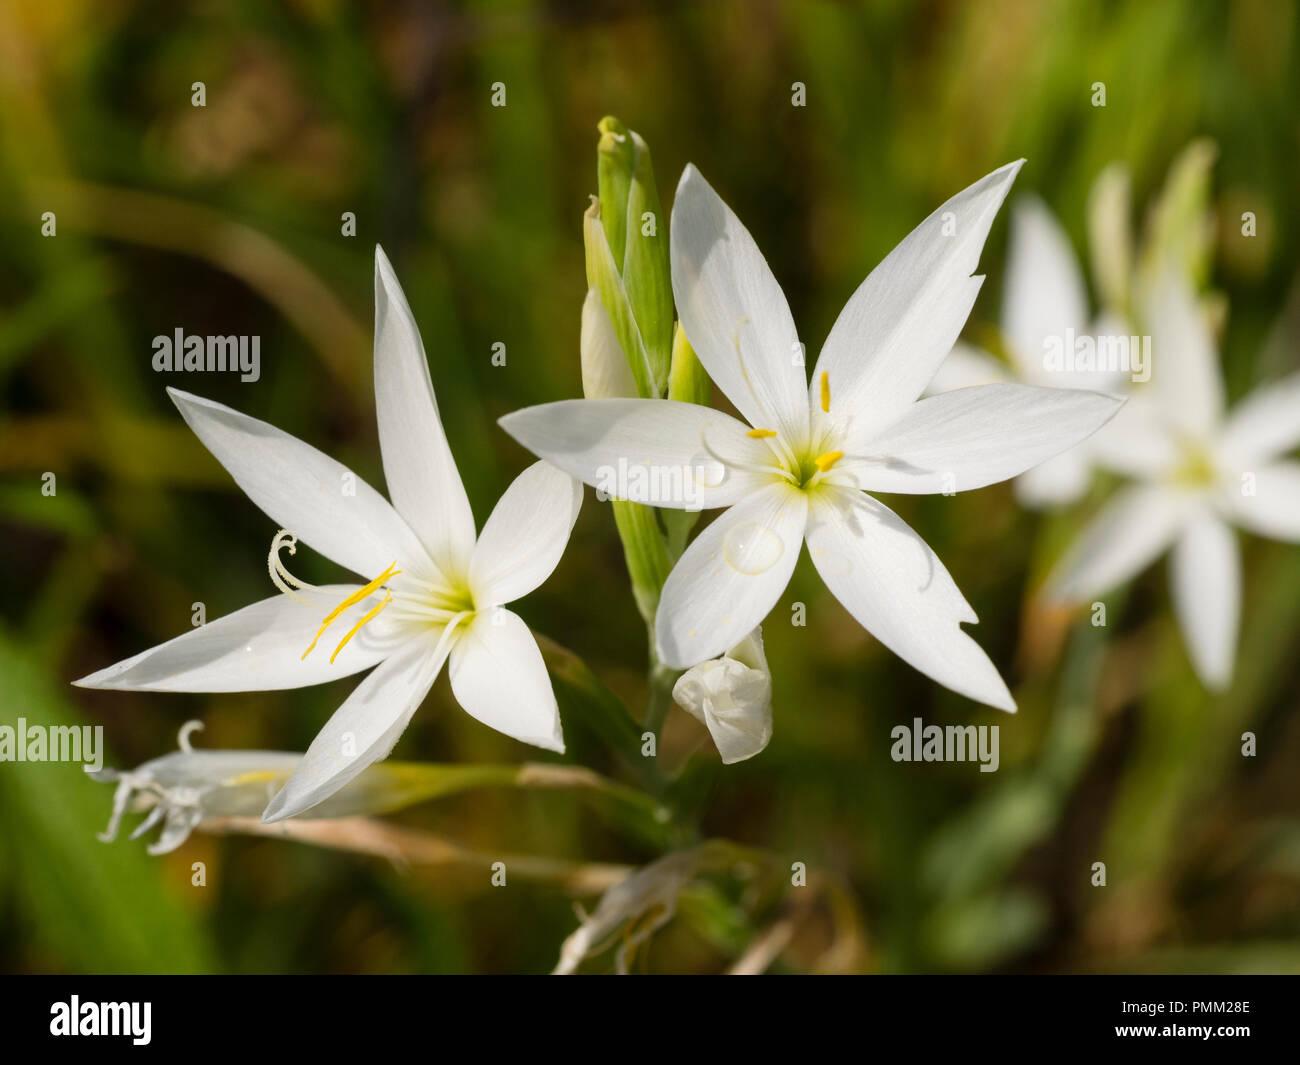 White Star Like Flowers Stock Photos & White Star Like Flowers Stock ...